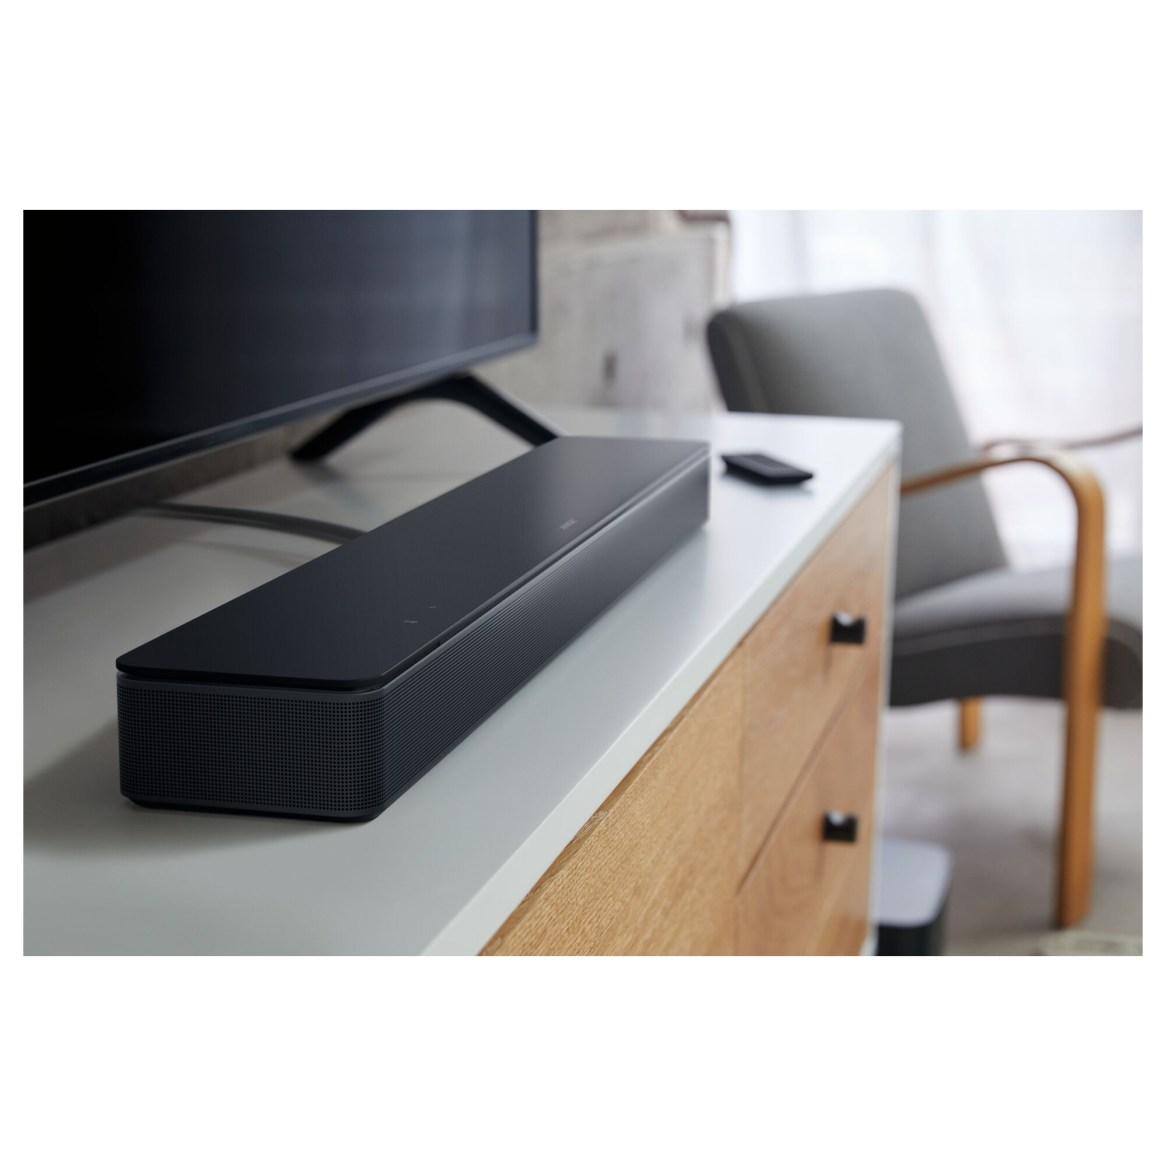 Barre de son Smart Soundbar 300 Bose